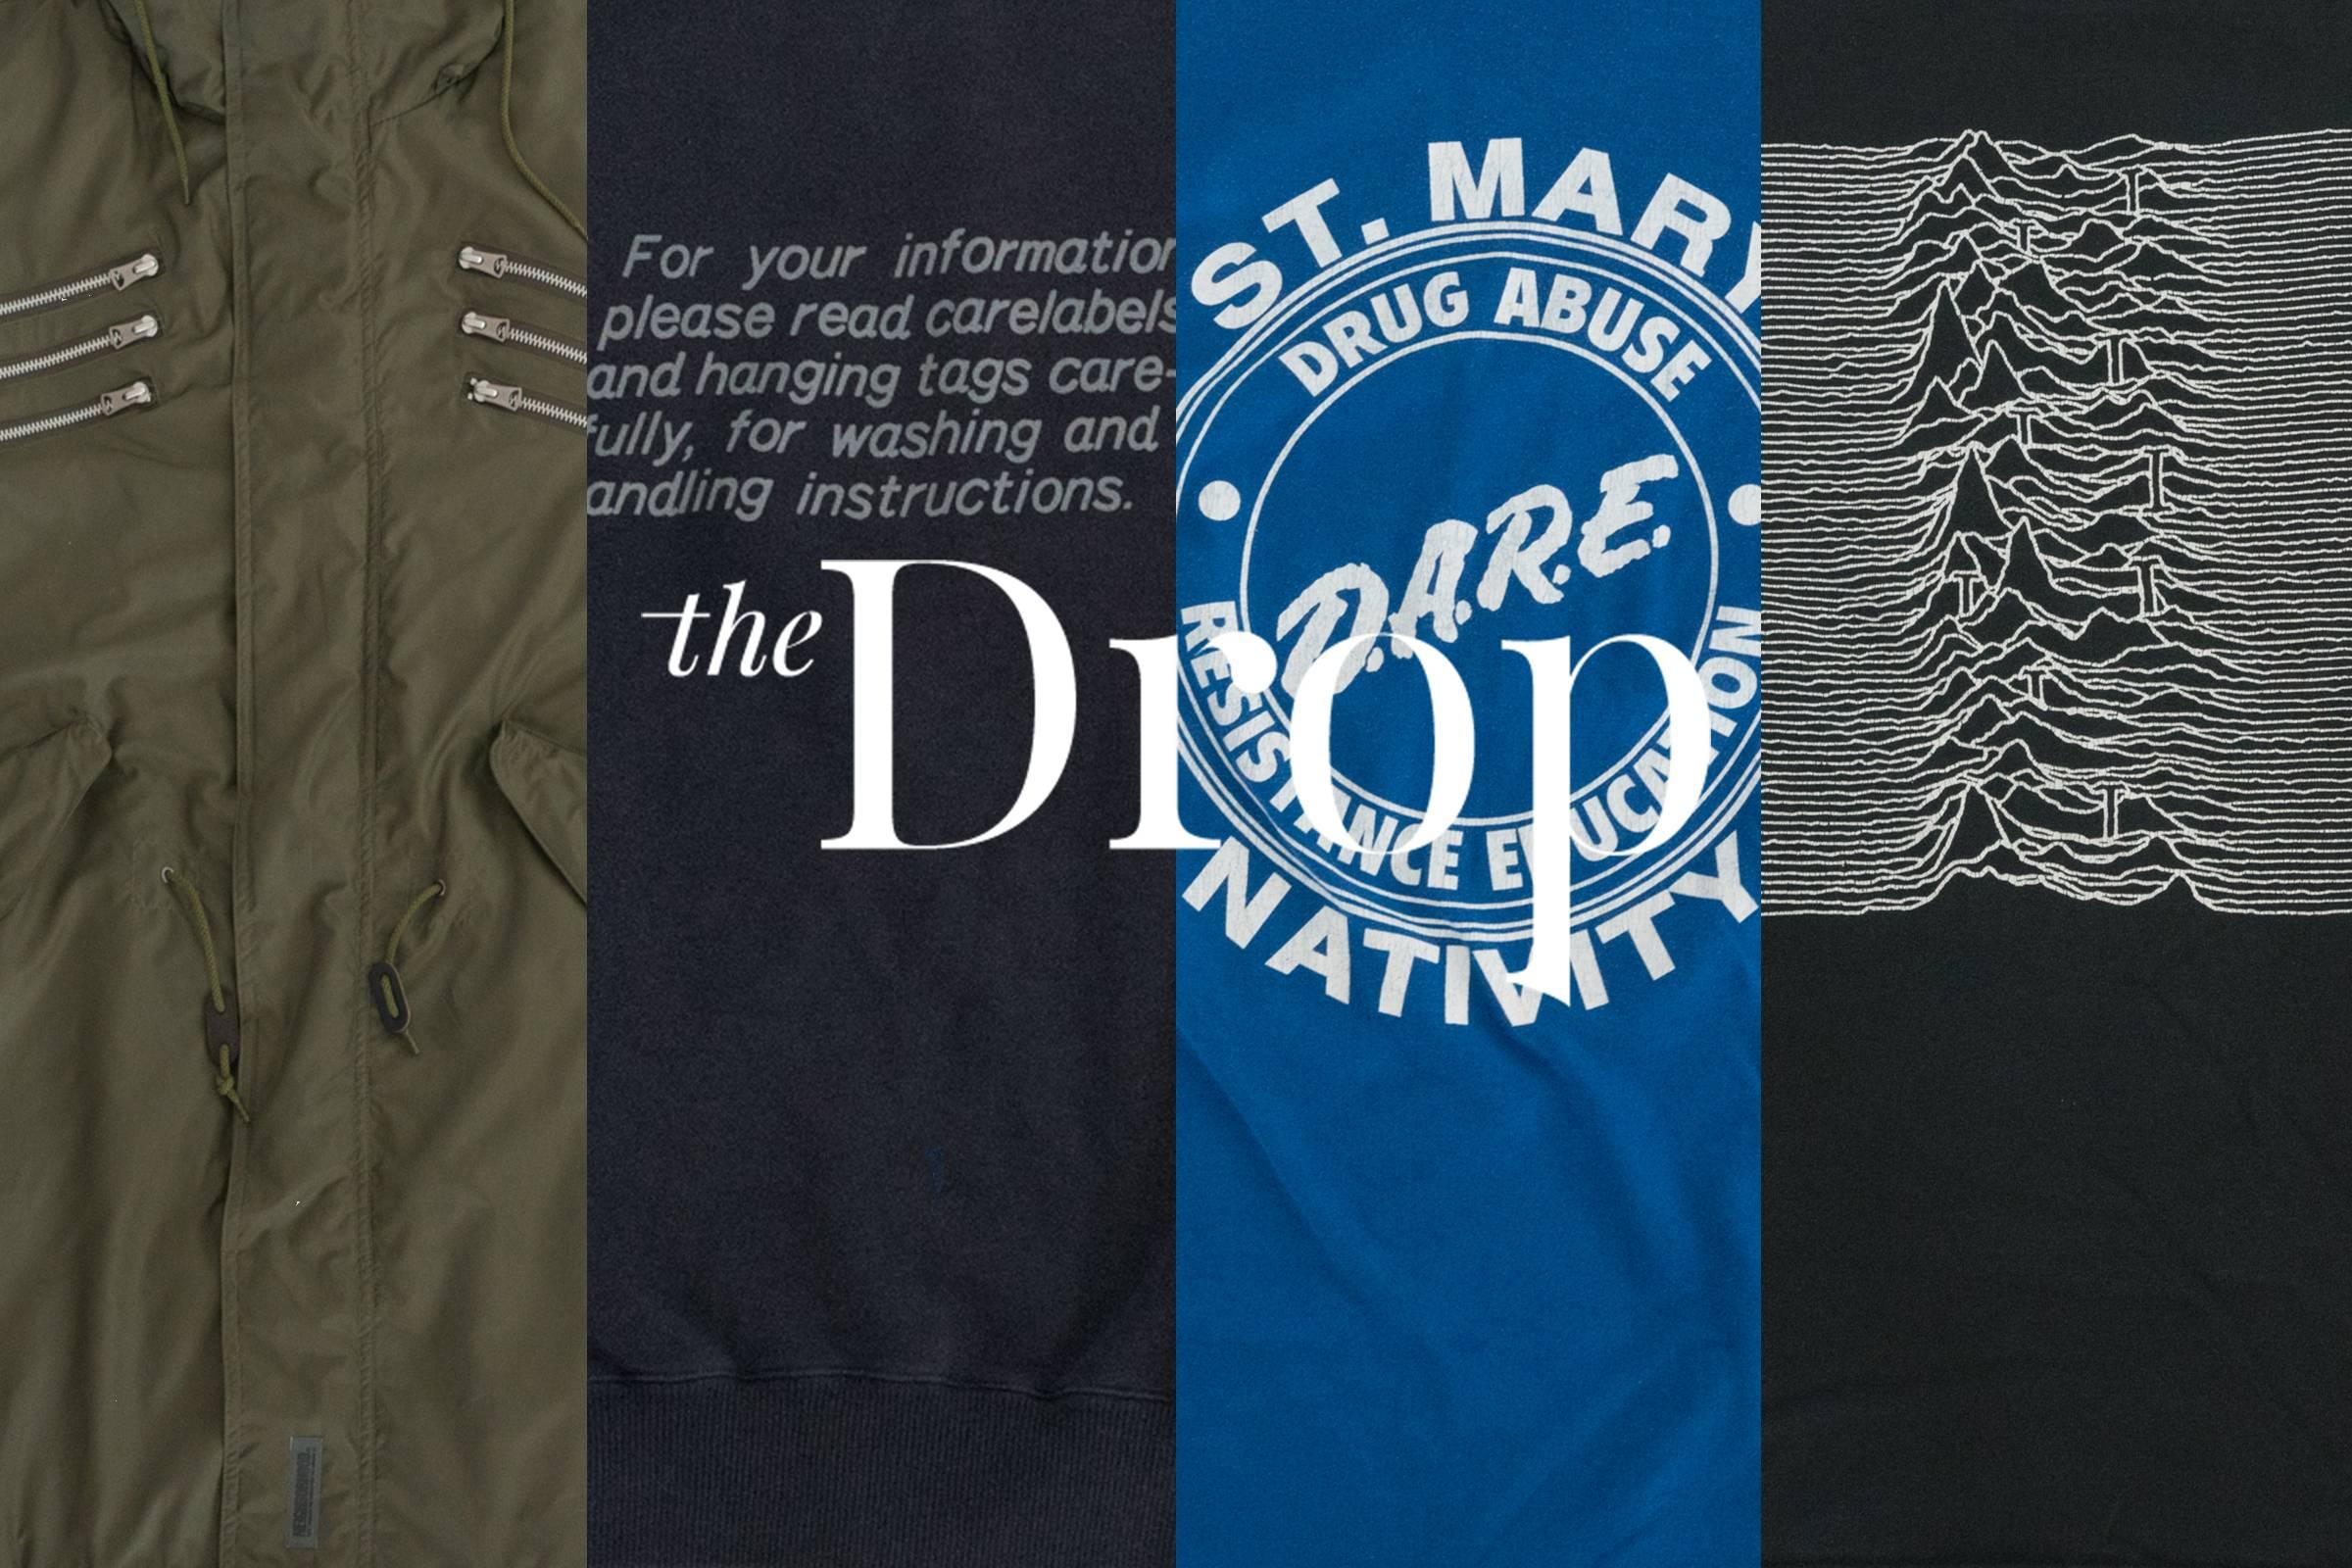 The Drop: November 2, 2016